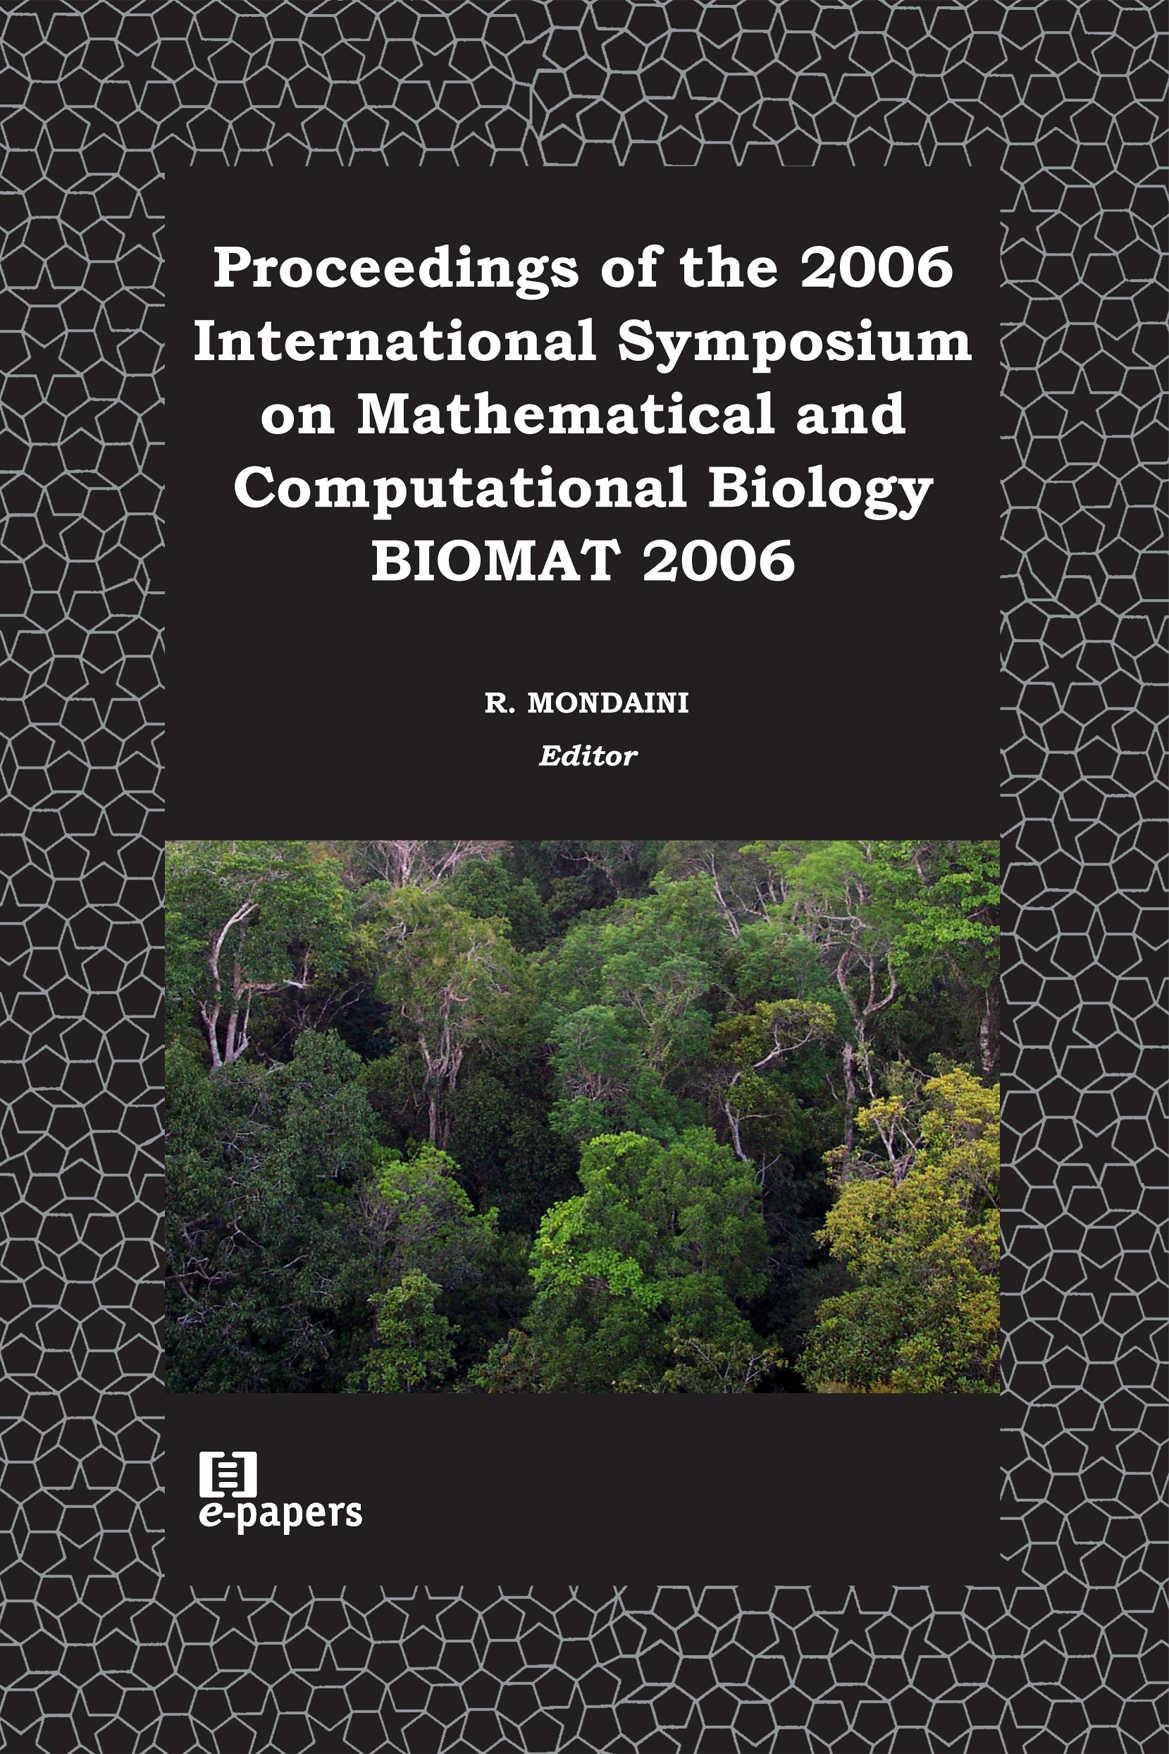 Proc. of the 2006 International Symposium on Mathematical and Computational Biology: BIOMAT 2006